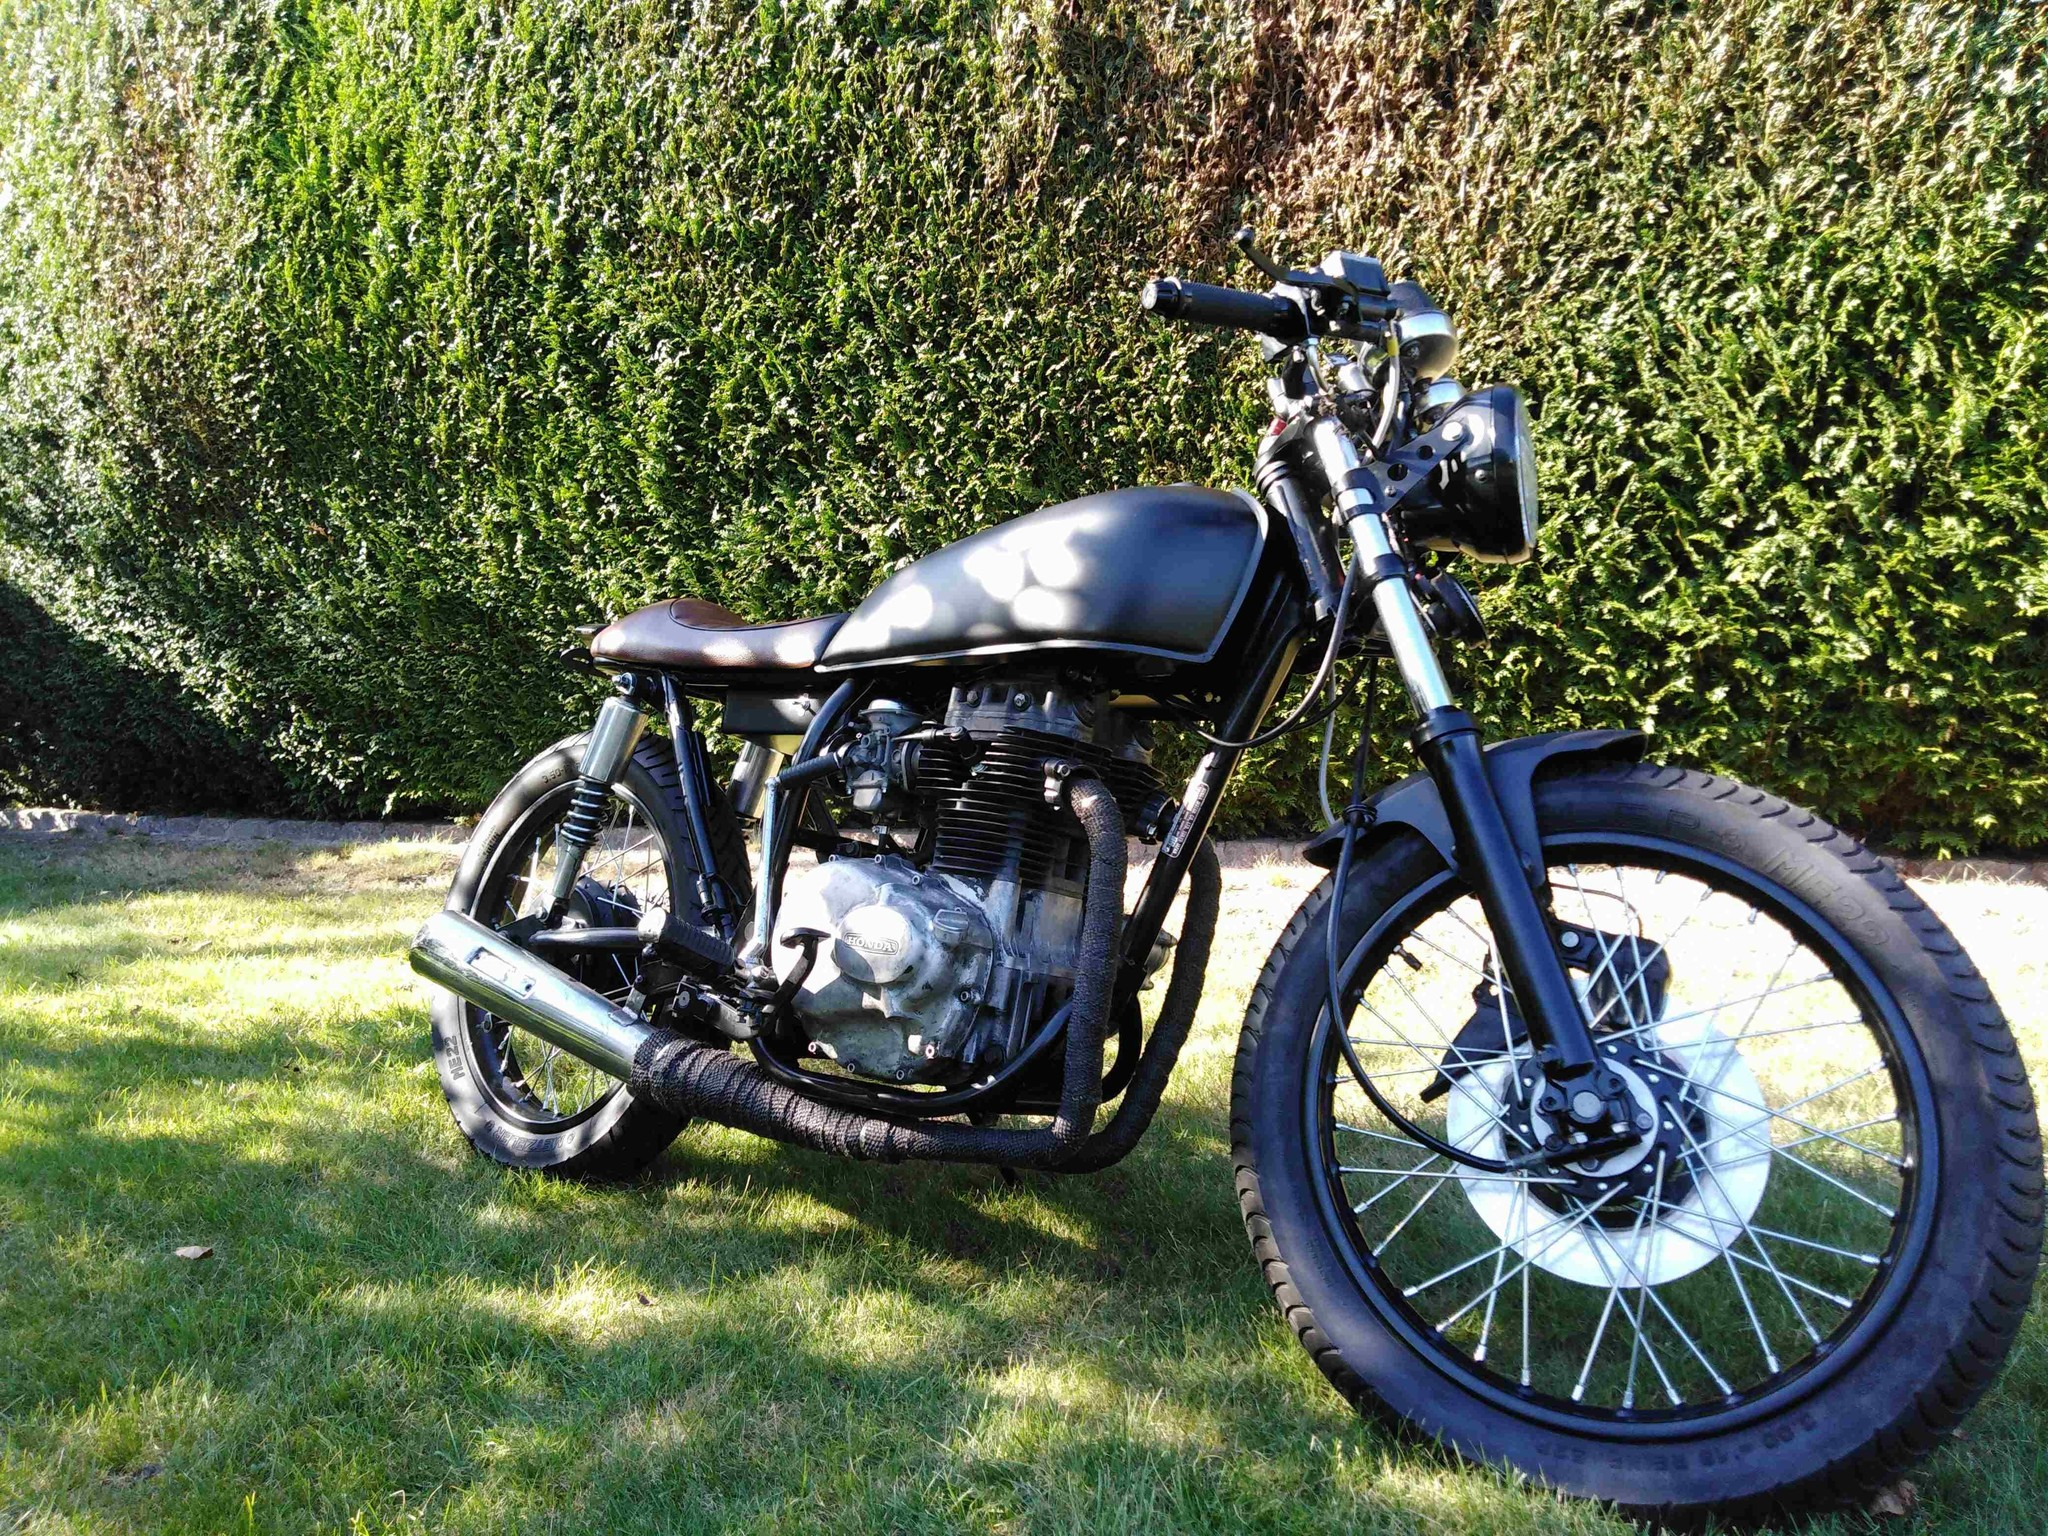 Betaalbare custom bikes 3500 euro